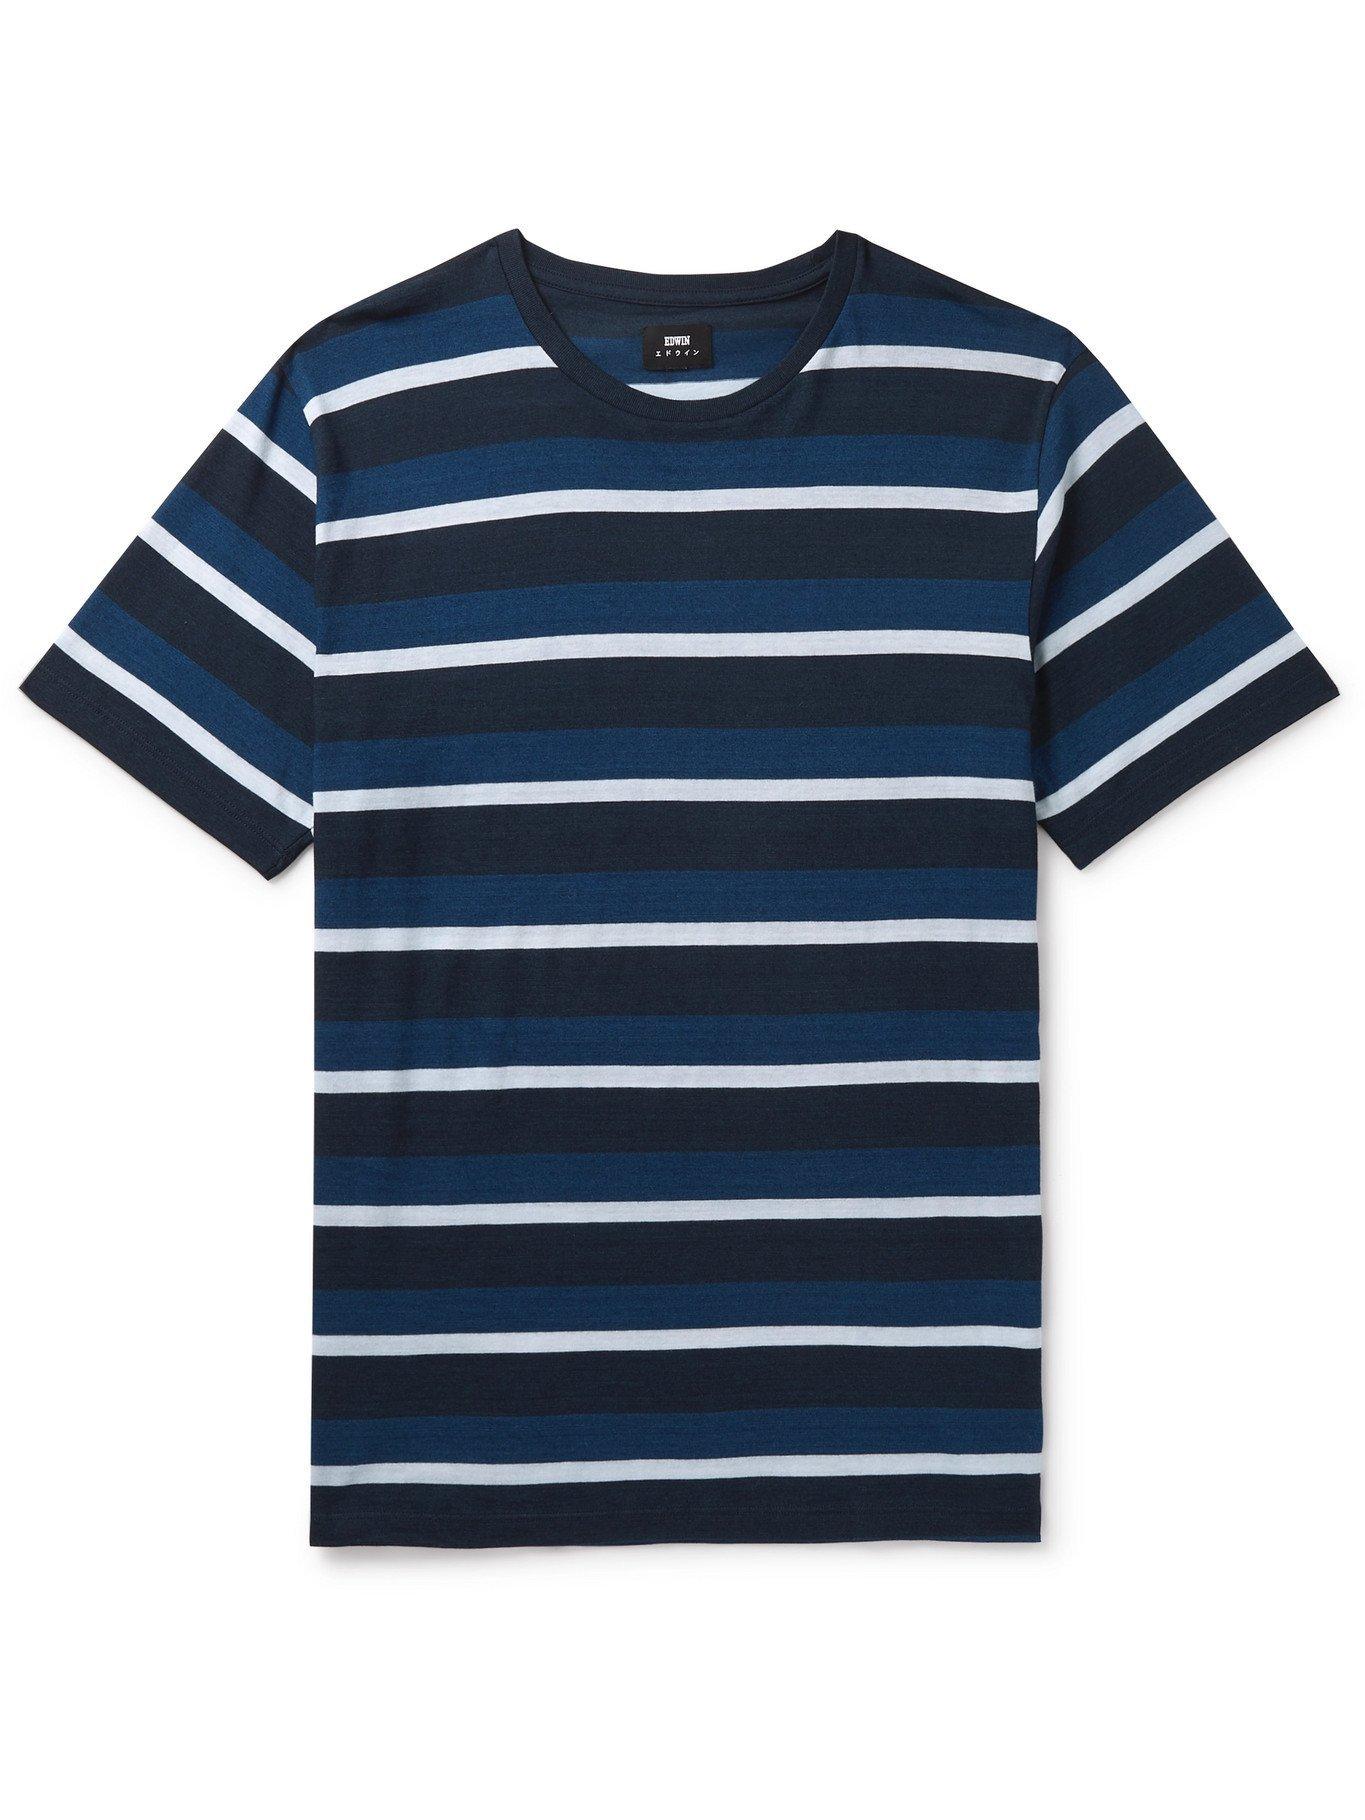 Photo: EDWIN - Cove Garment-Dyed Striped Cotton T-Shirt - Blue